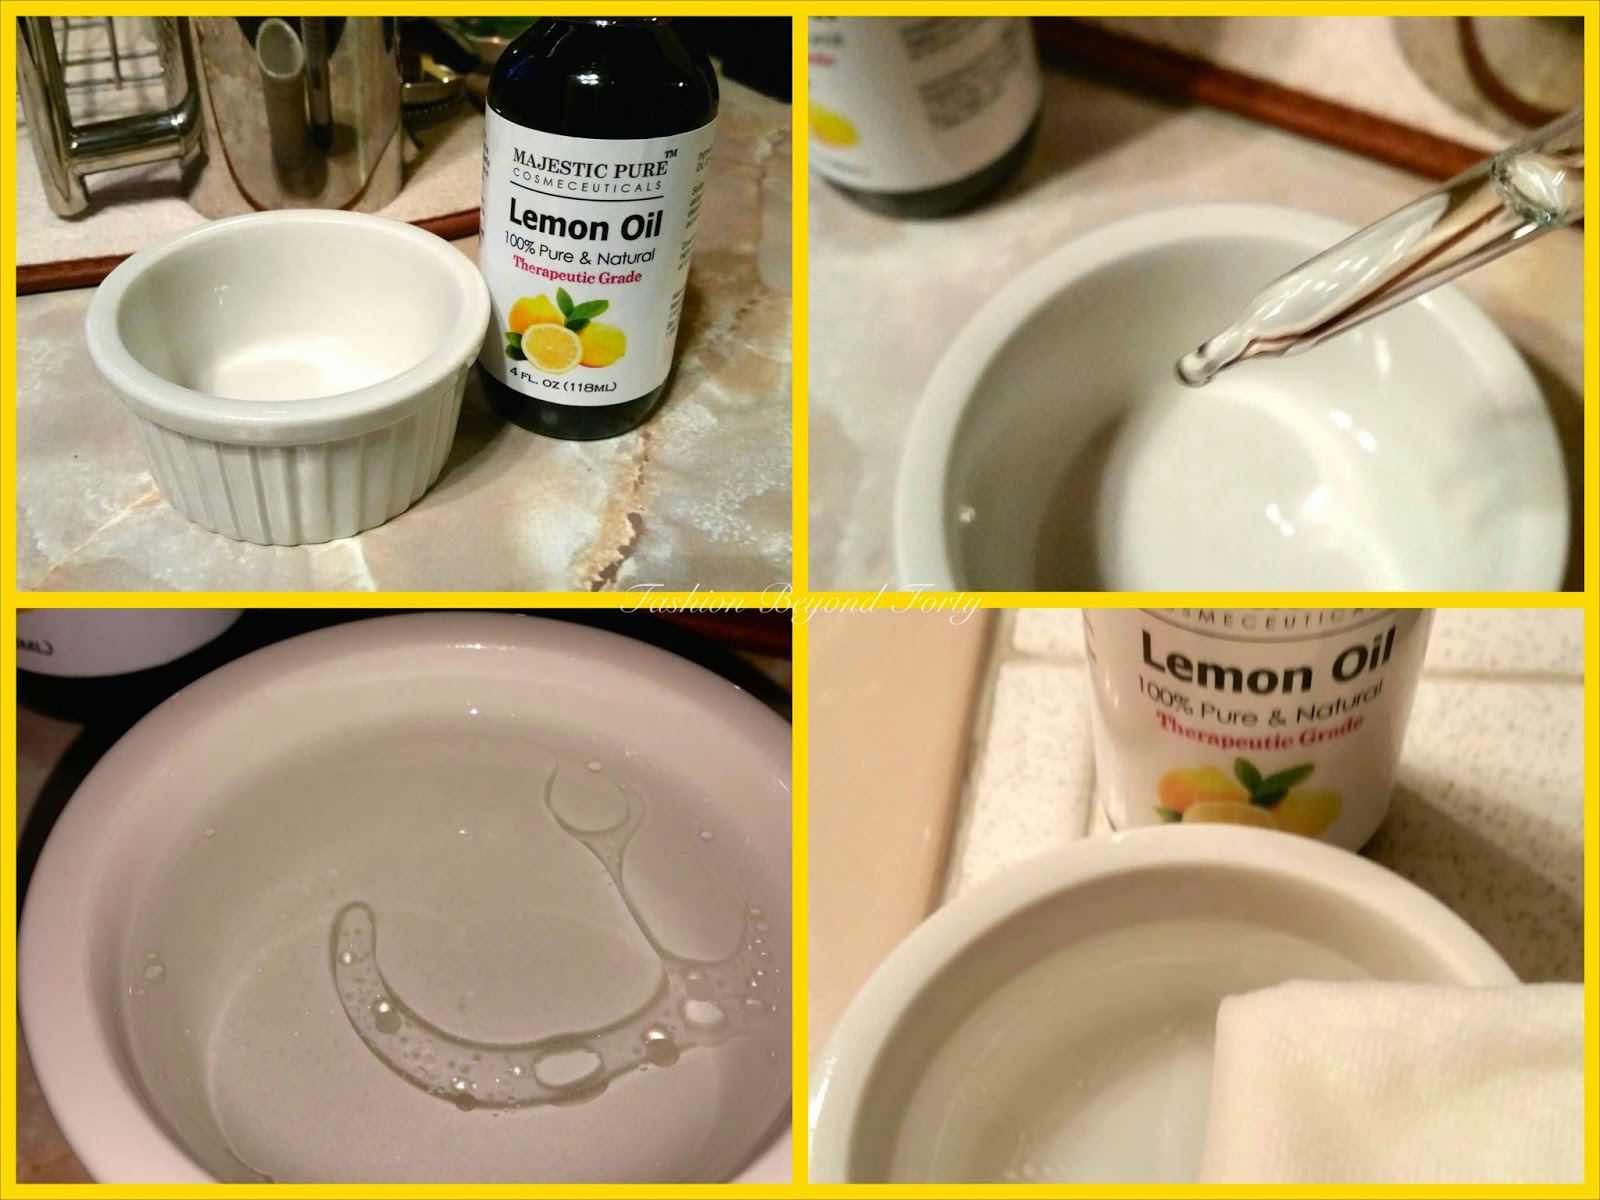 Majestic 100% Natural Lemon Oil Review